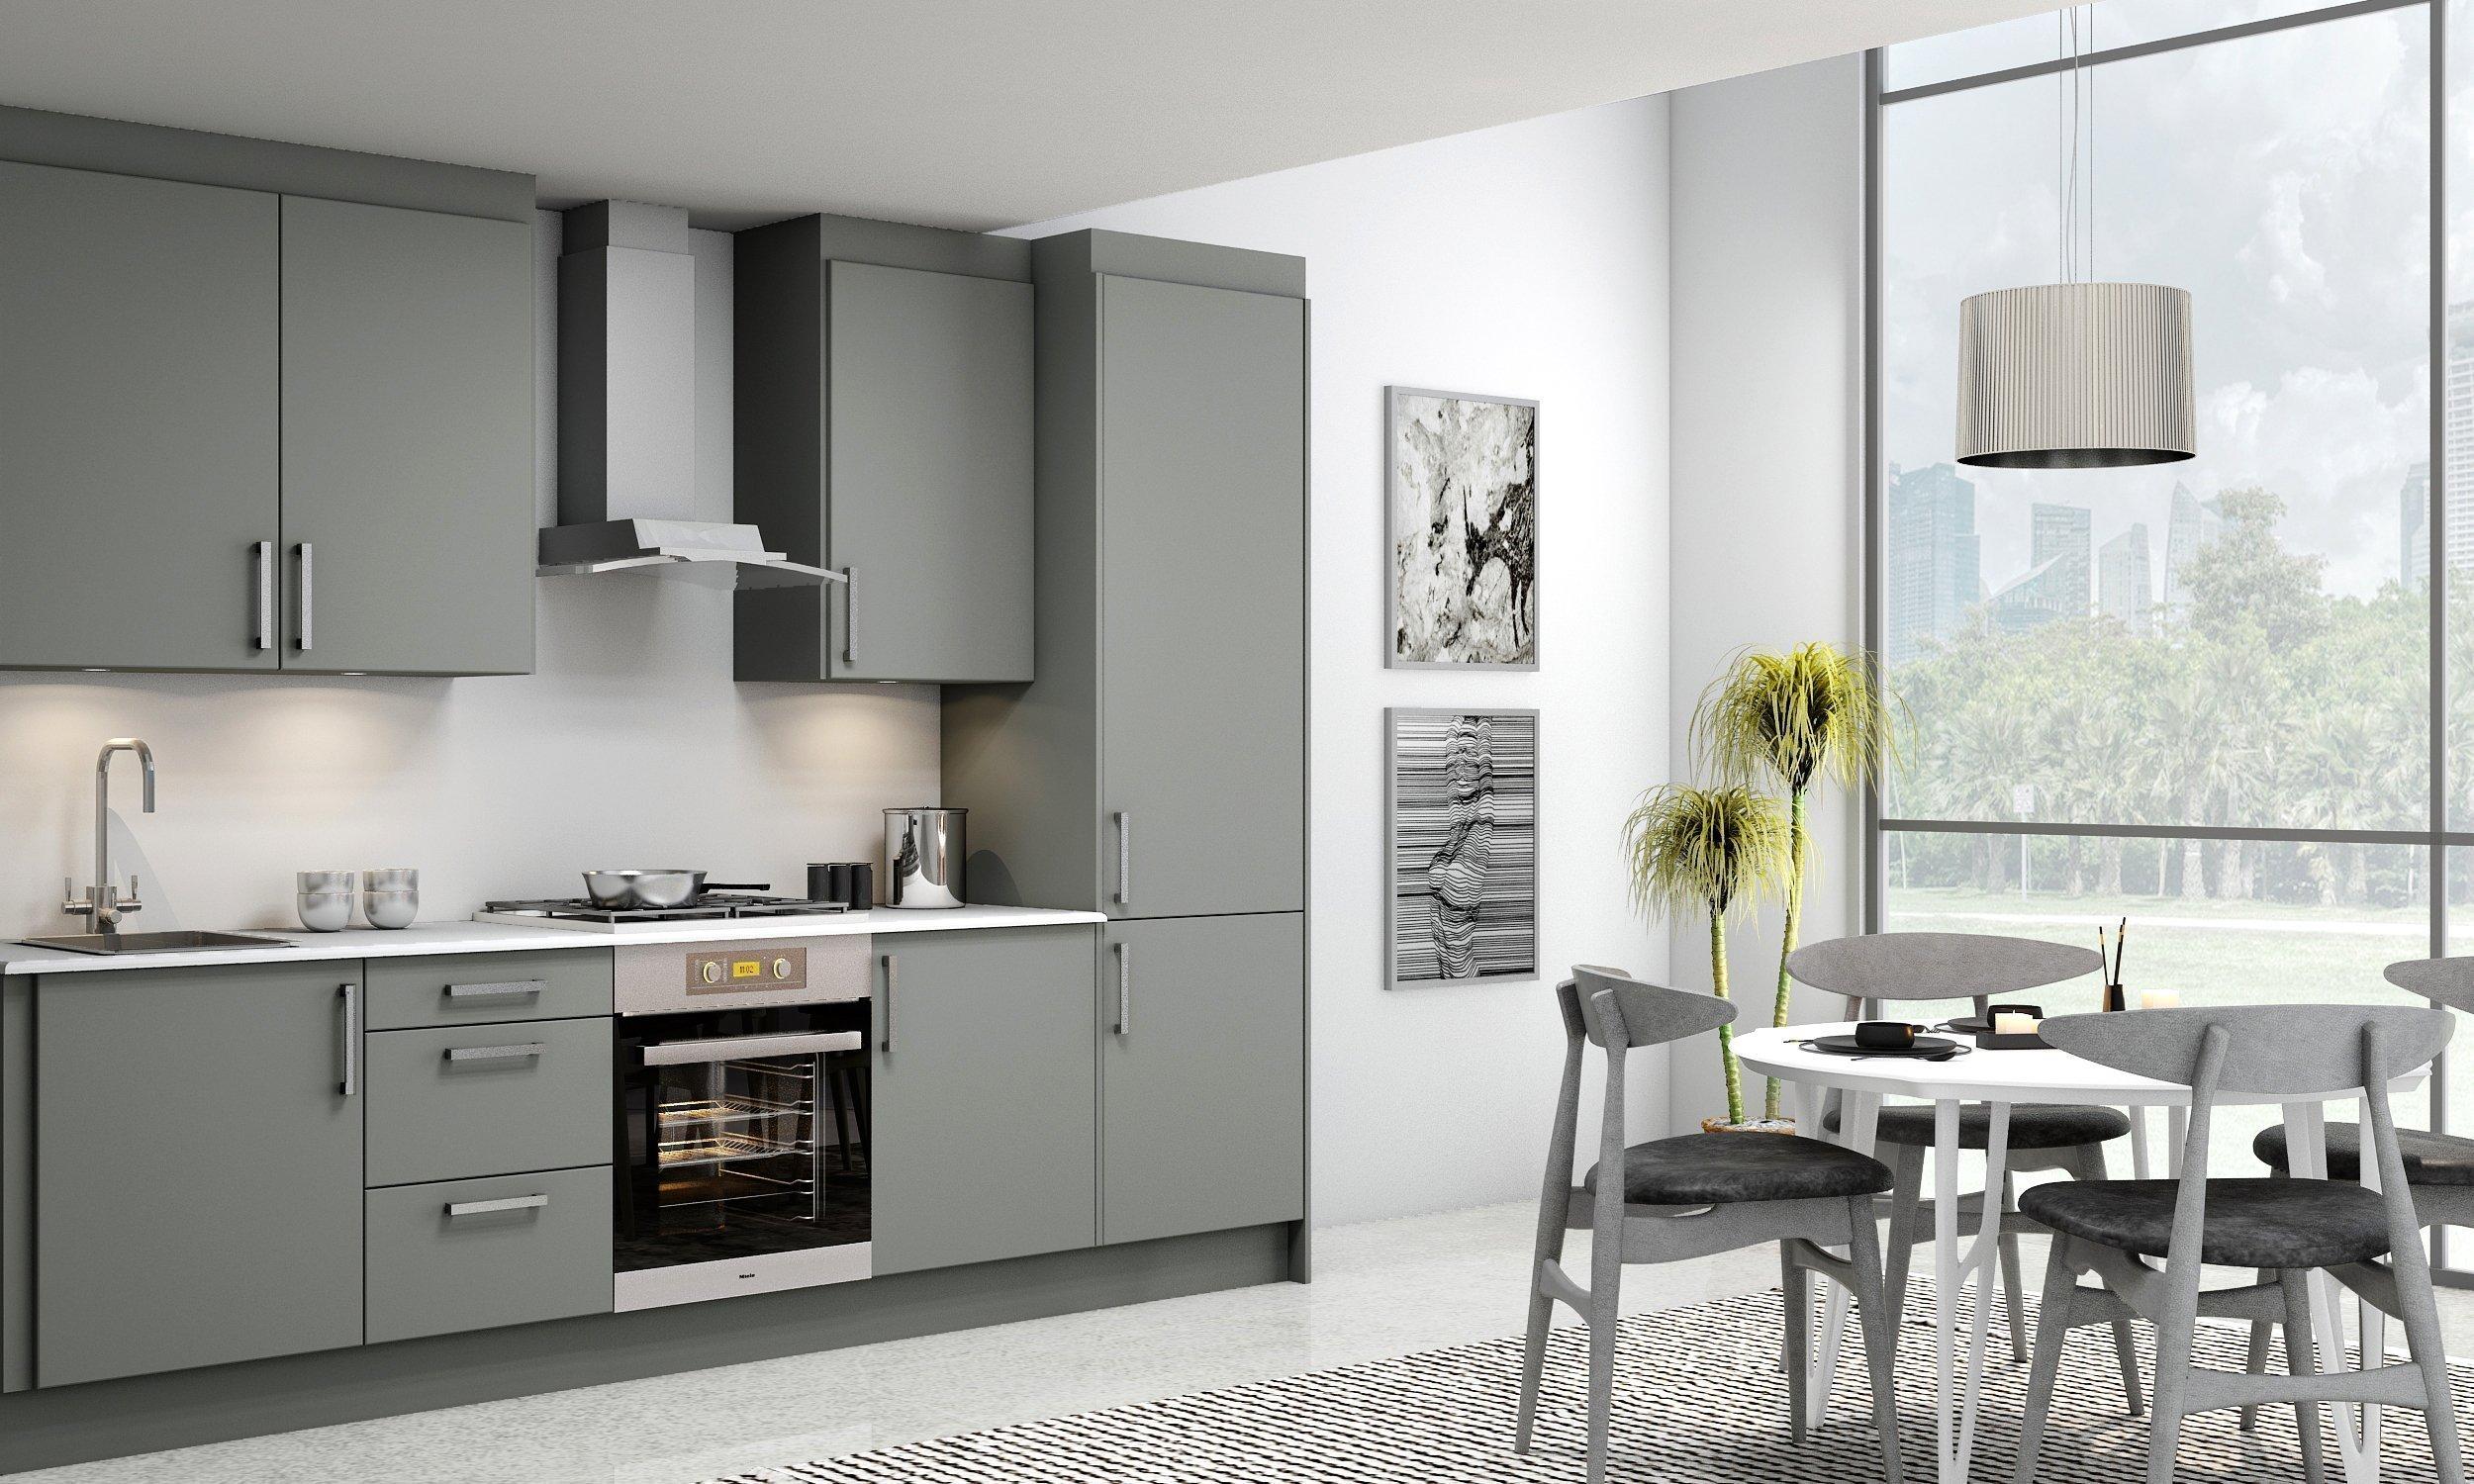 10ft Easyline Kitchen With Handle in Stone Grey Matt Finish